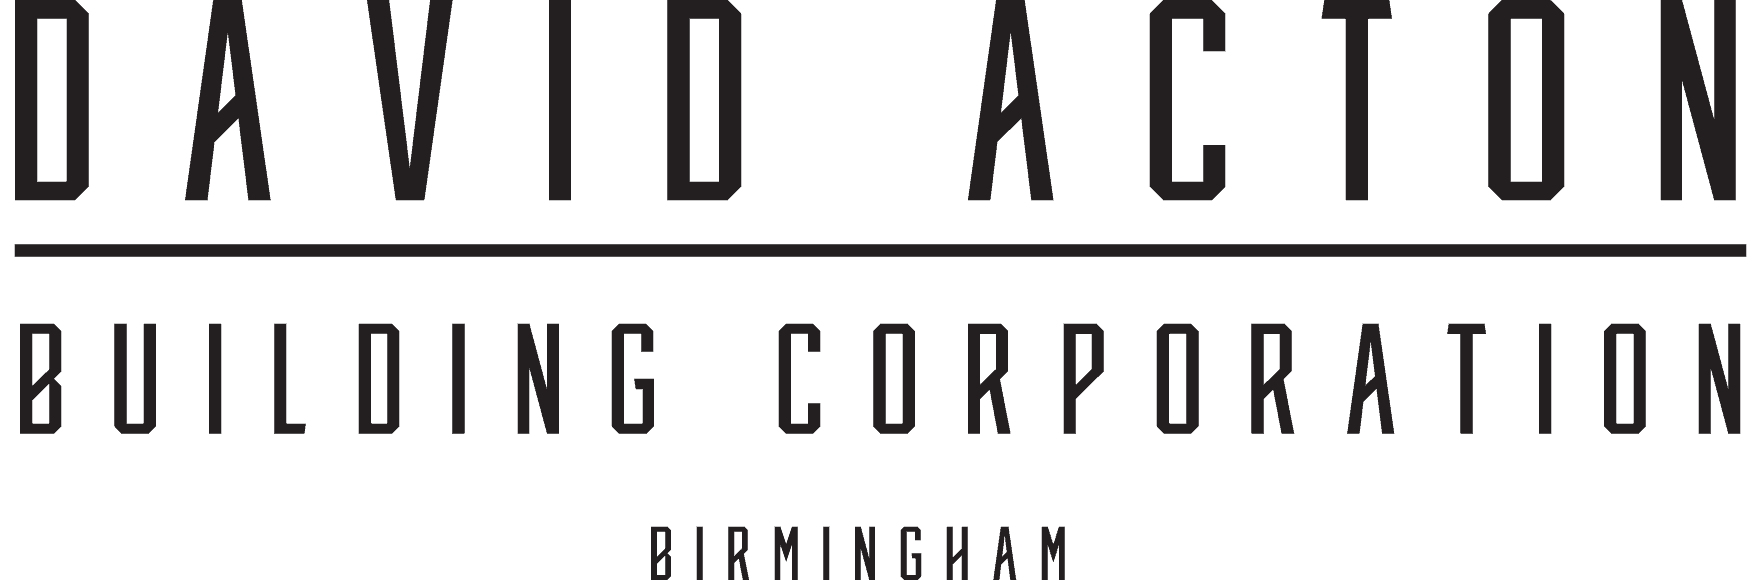 DABC-logo-Bham